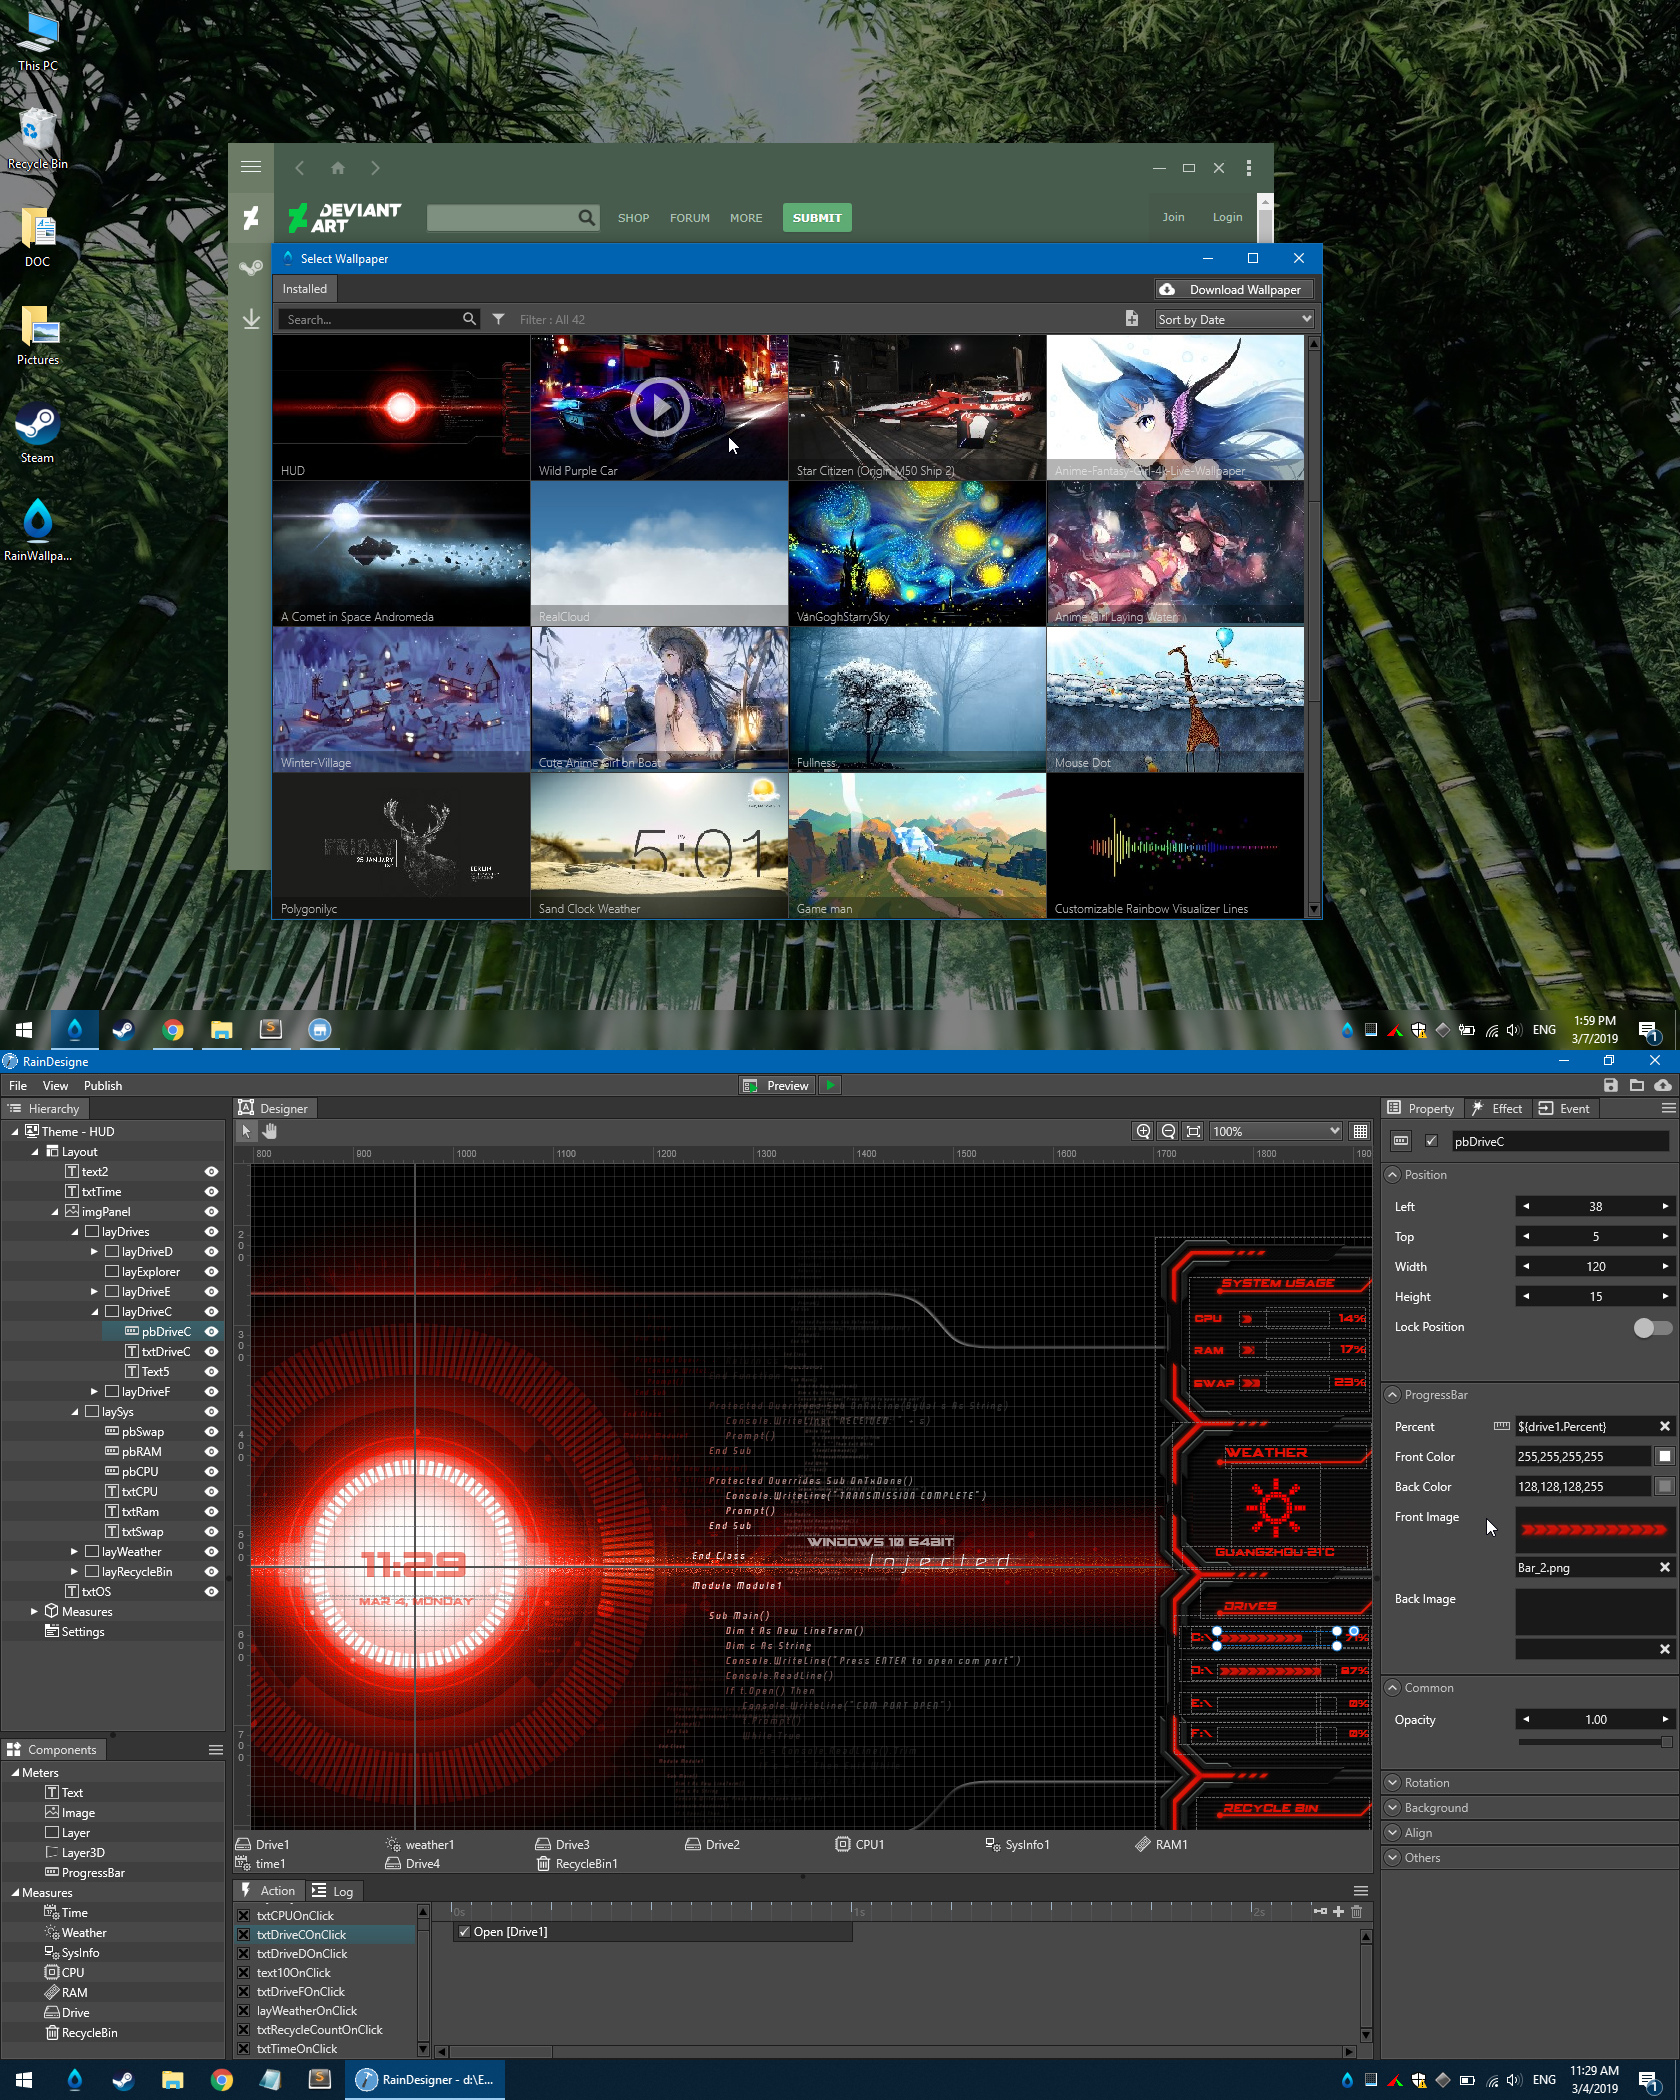 Rainwallpaper Live Wallpaper Engine 2 7 1 By Rainysoft On Deviantart